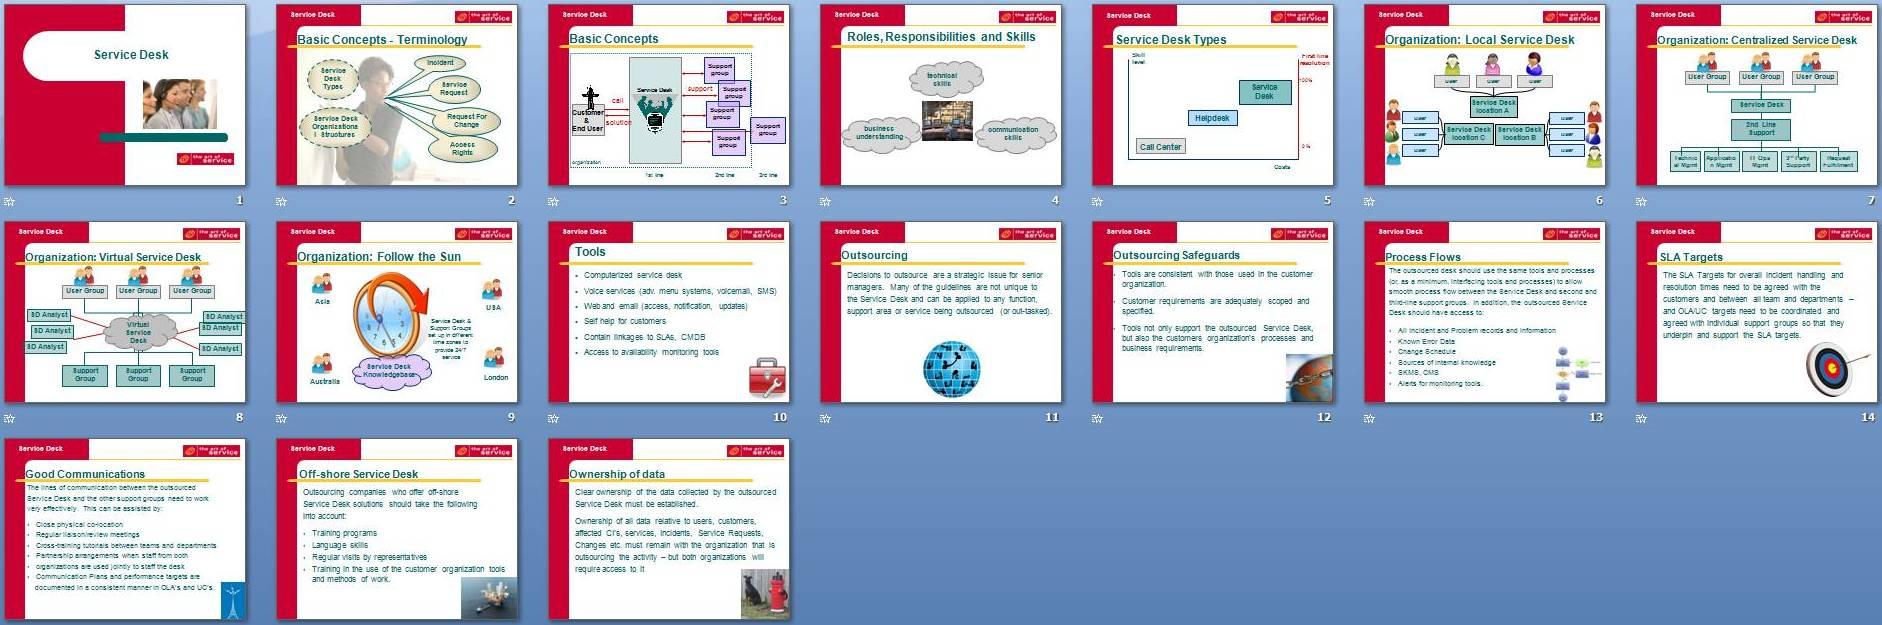 powerpoint presentation service desk | college paper service, Presentation templates